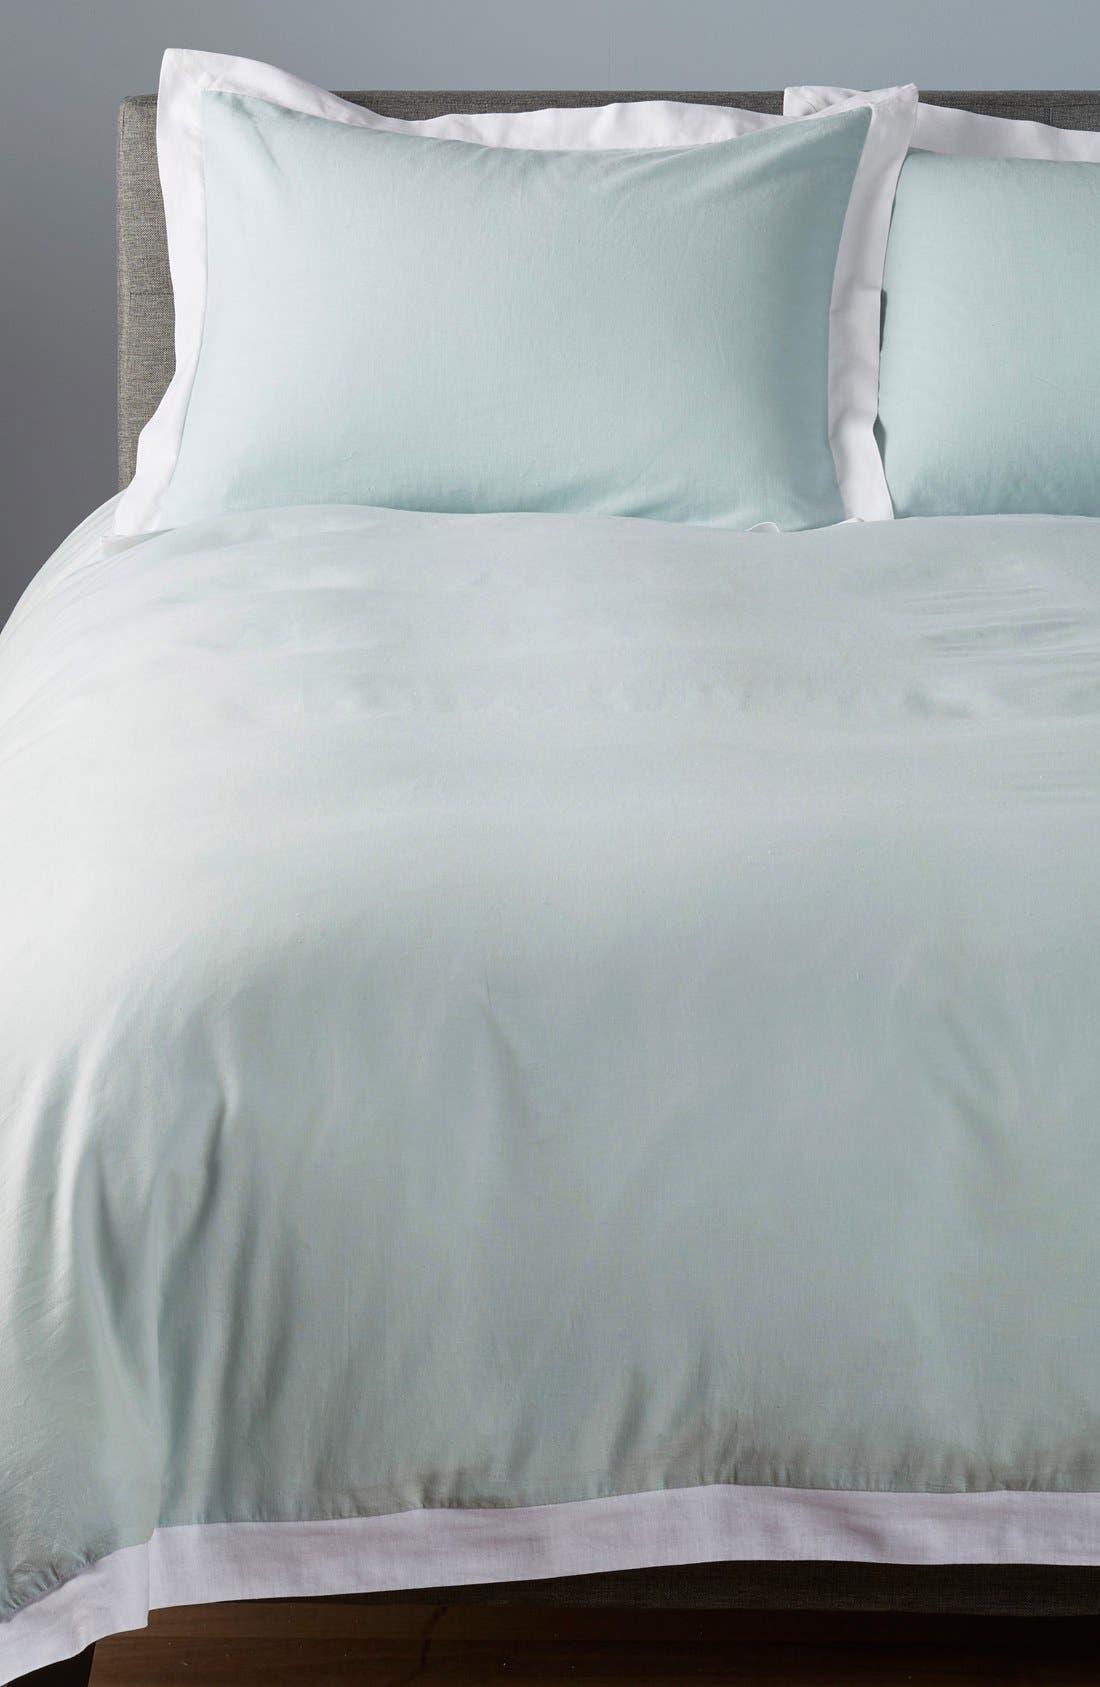 'Spa' Washed Linen Duvet Cover,                             Main thumbnail 1, color,                             400